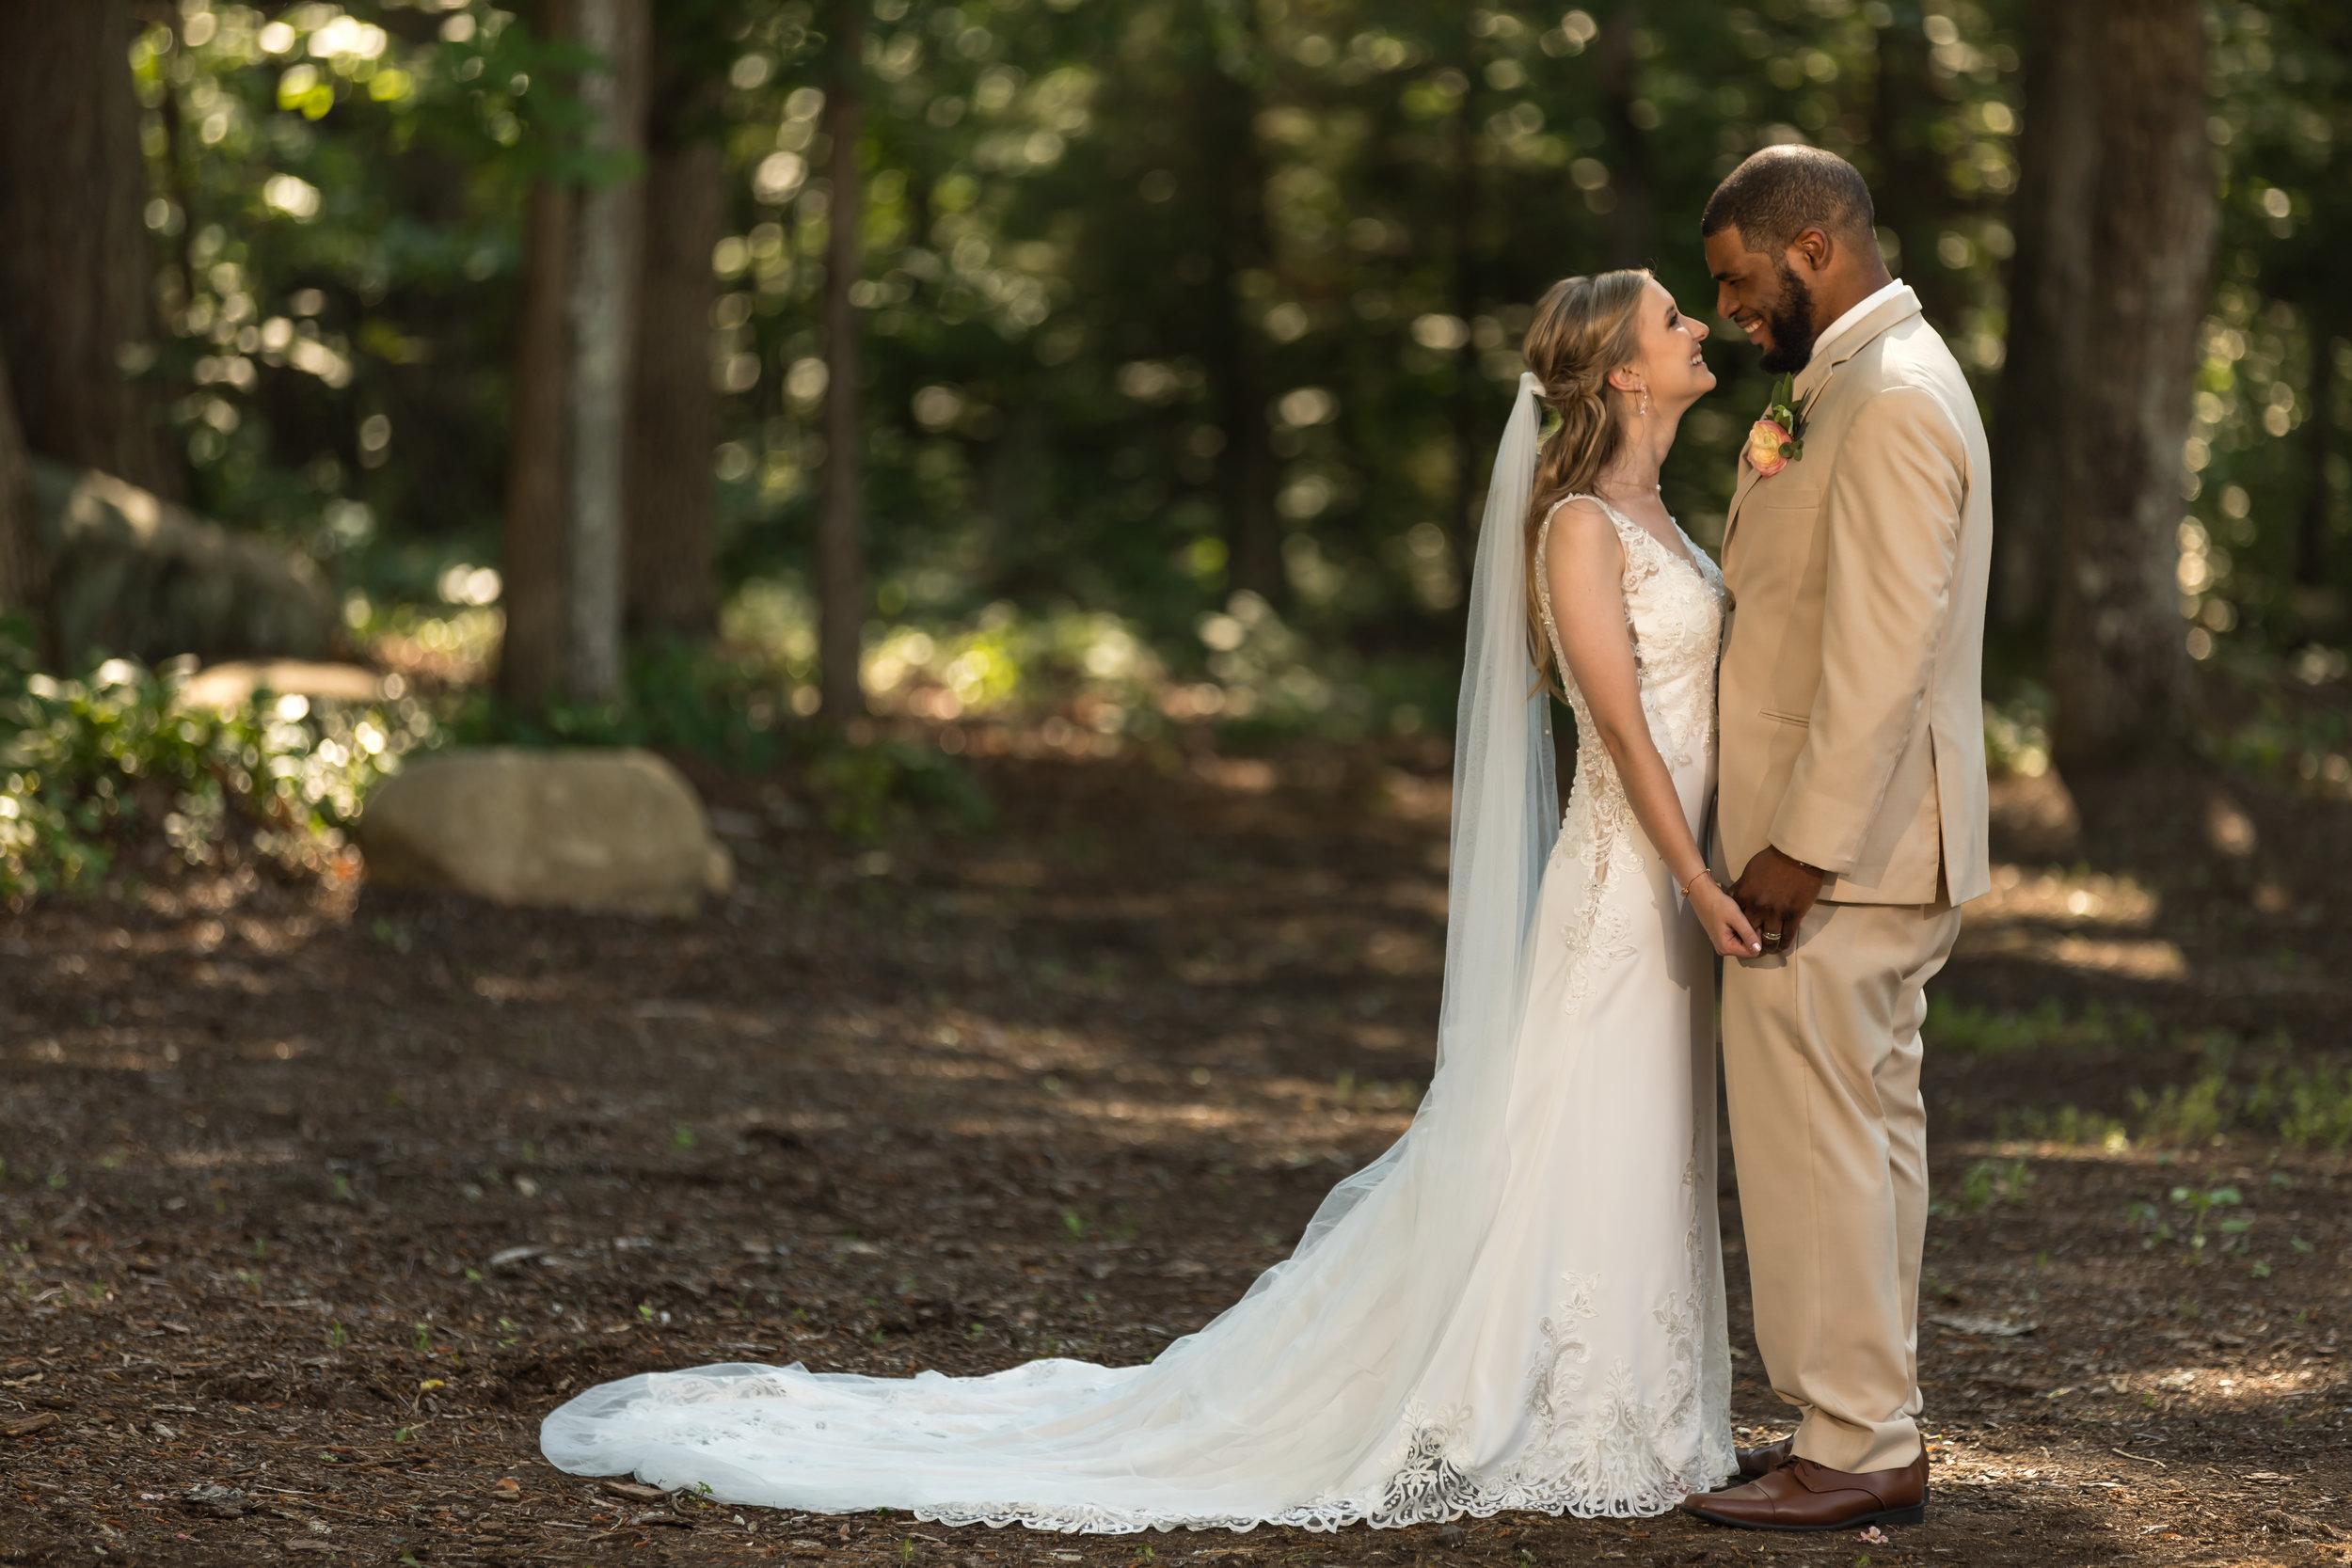 sarah_ikeem_wedding_at_the_parlour_at_manns_chapel_05.18.19-0807.jpg